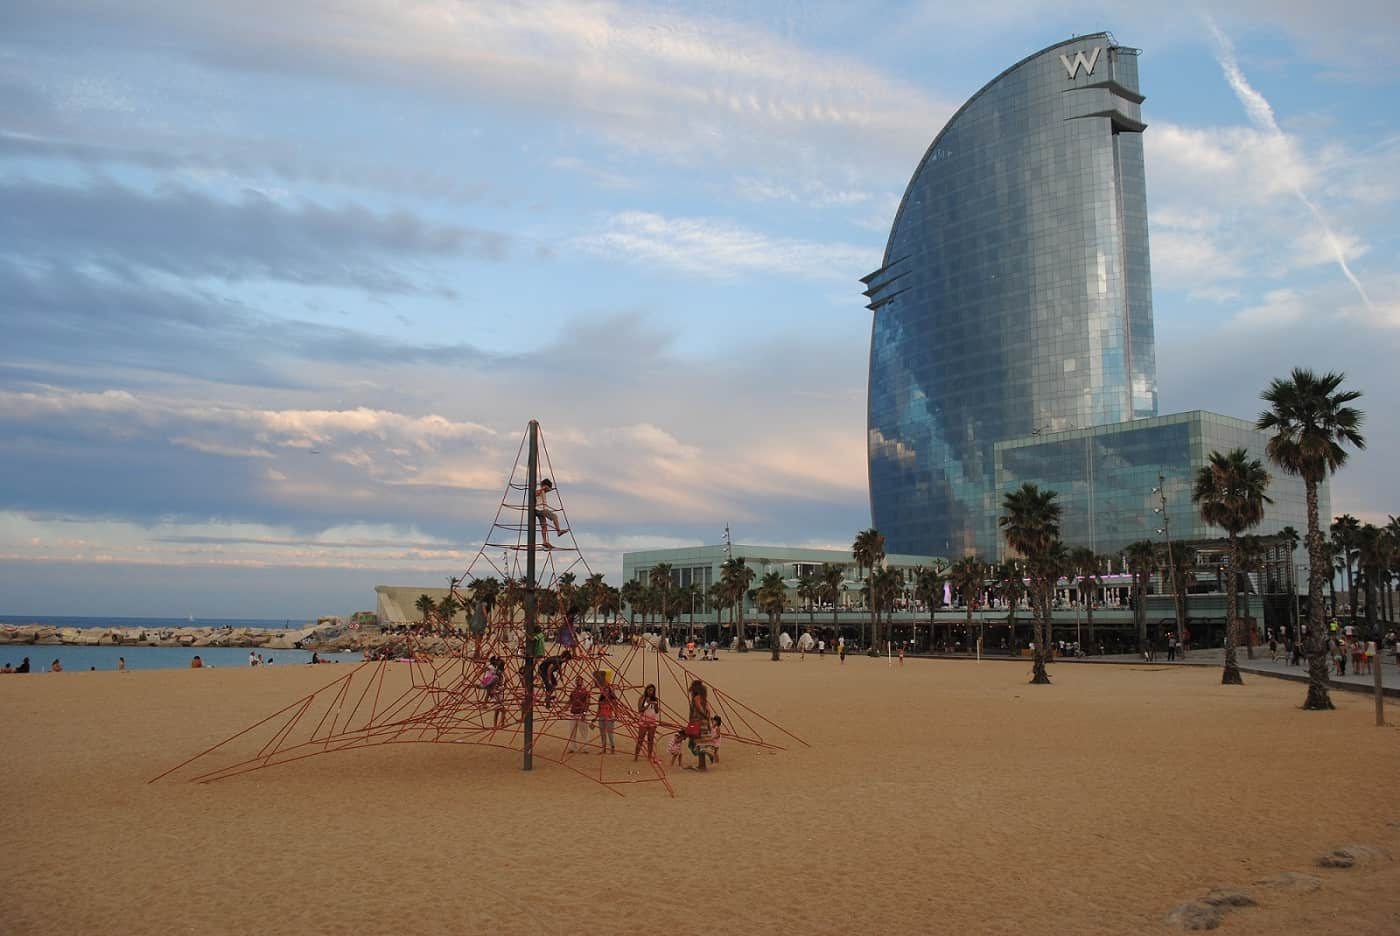 W hotel barcelona barcelona navigator for Hotel barcelona w